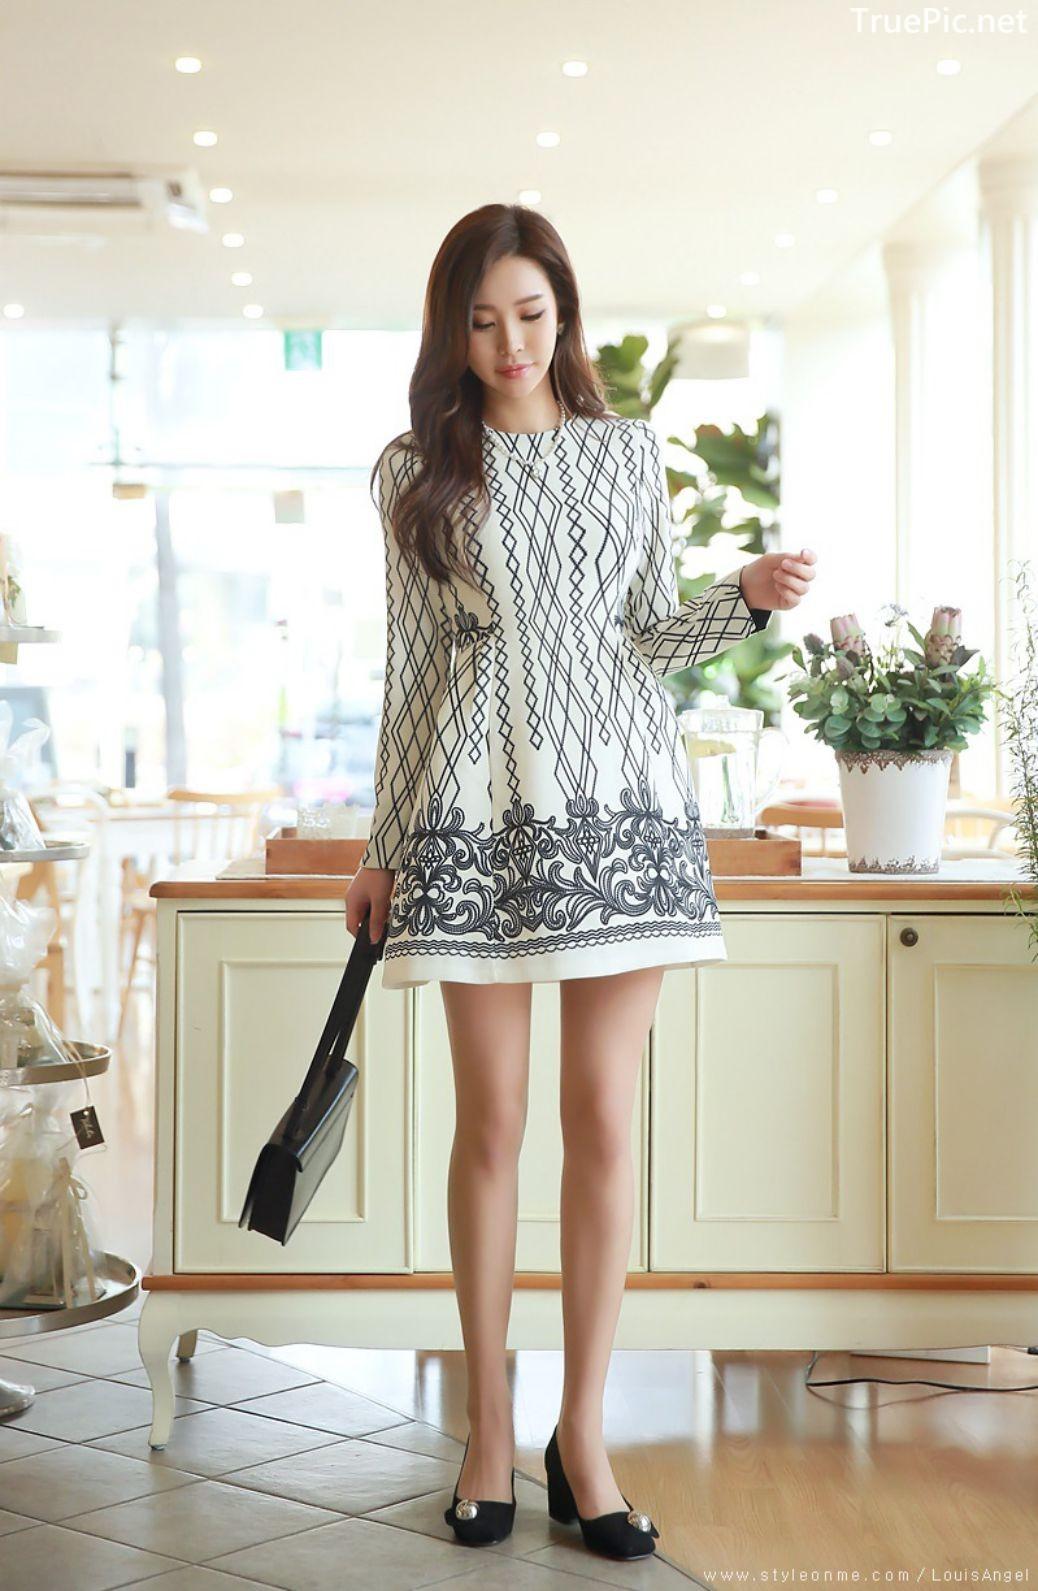 Image-Korean-Fashion-Model-Park-Da-Hyun-Office-Dress-Collection-TruePic.net- Picture-5